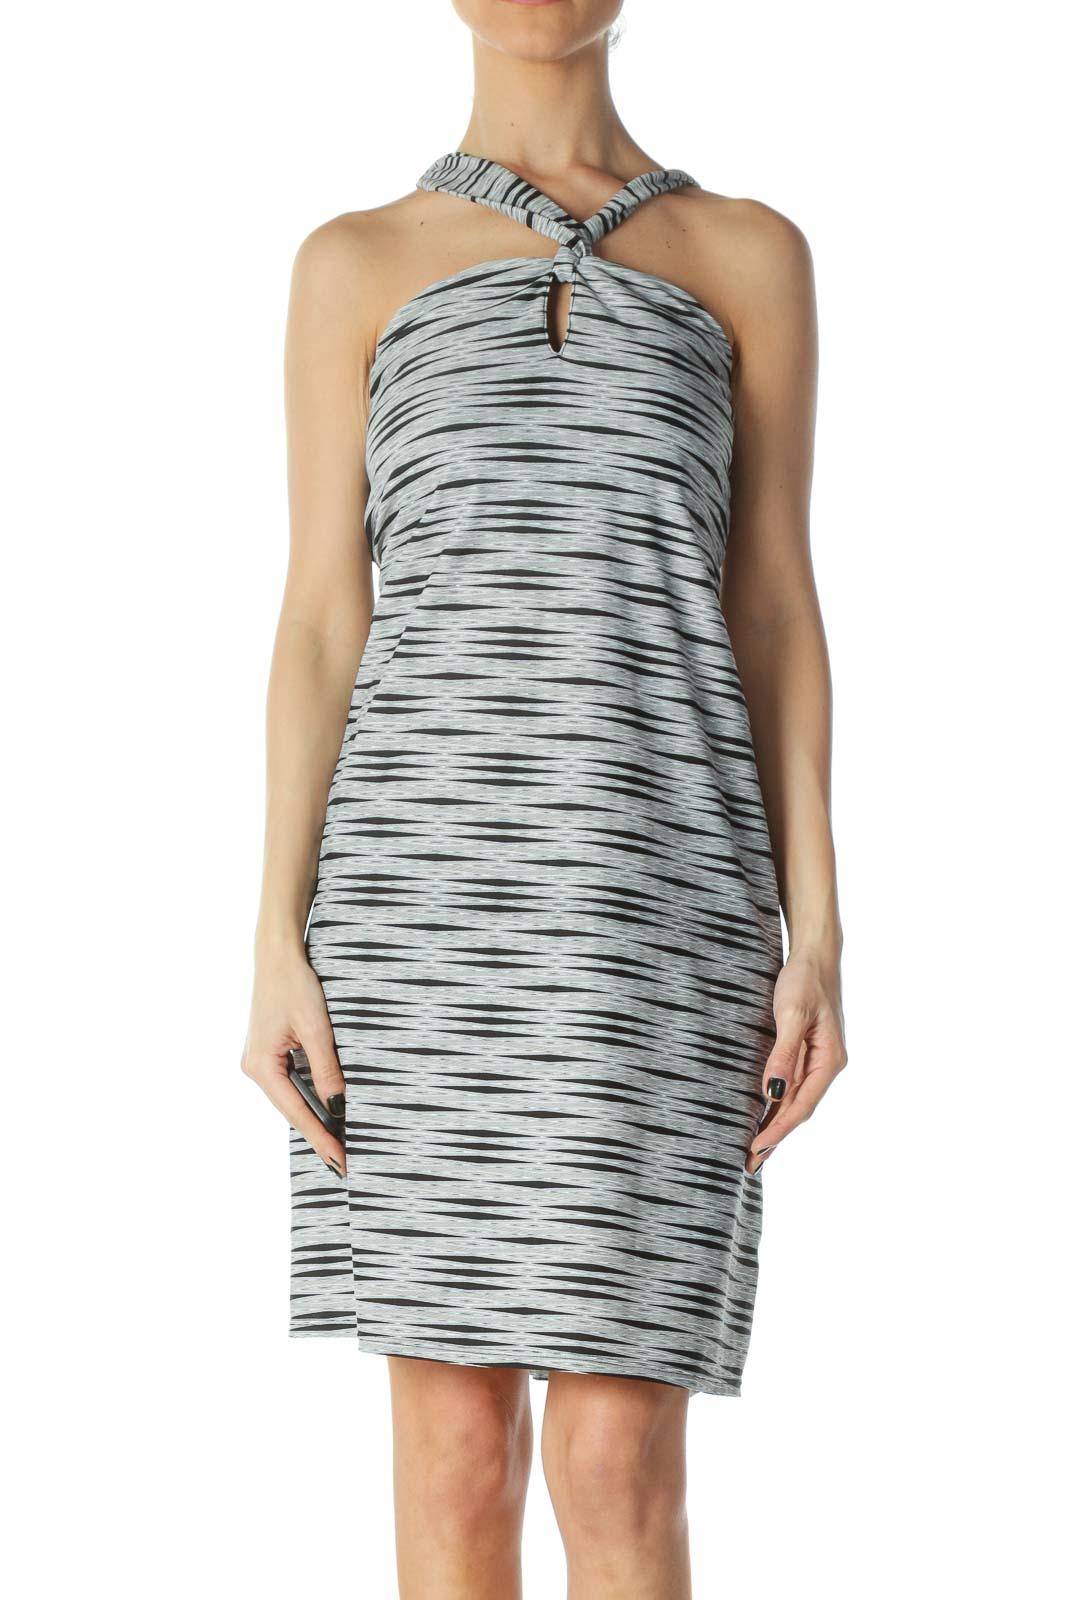 Grey Spandex Criss-Cross Keyhole Dress Front